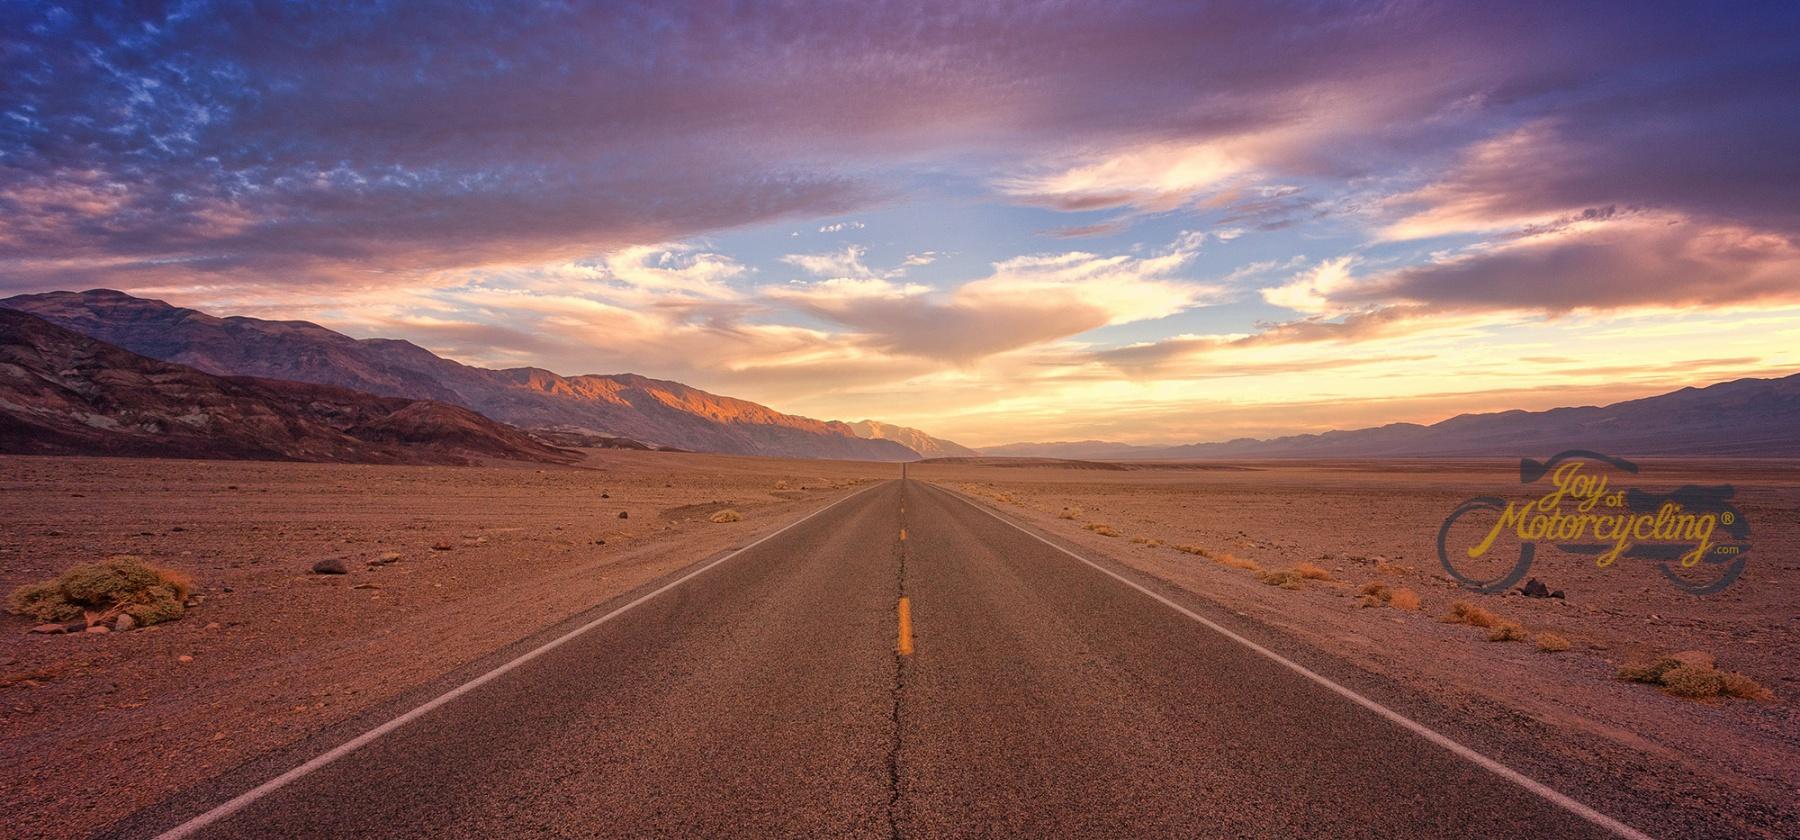 Death Valley NP, CA, USA - Photo by Joahannes Plenio via Unsplash